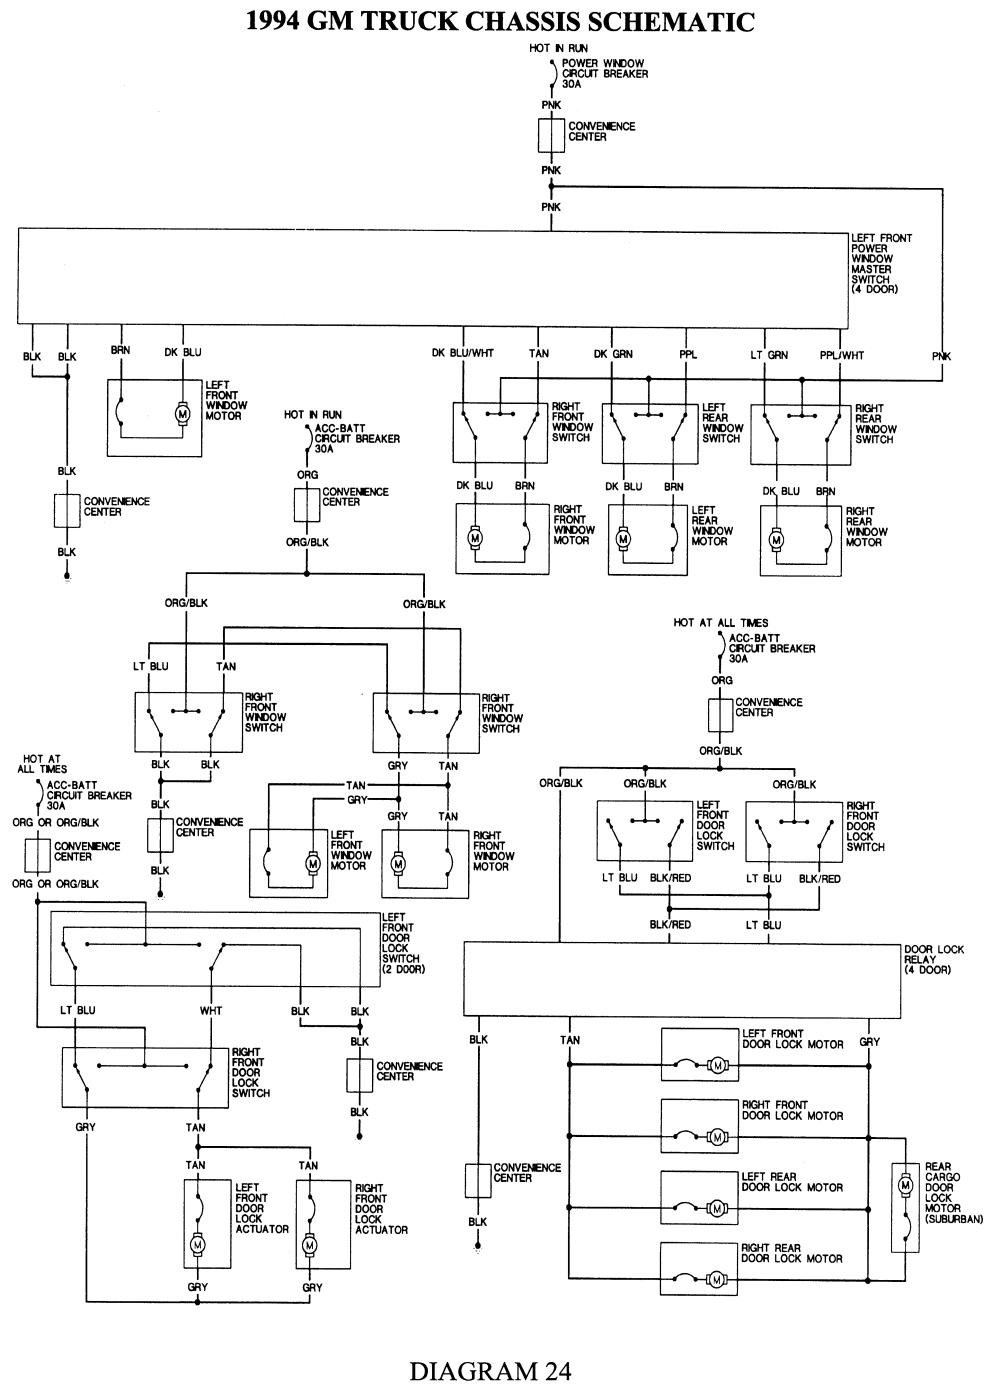 Chevrolet S10 Wiring Diagram